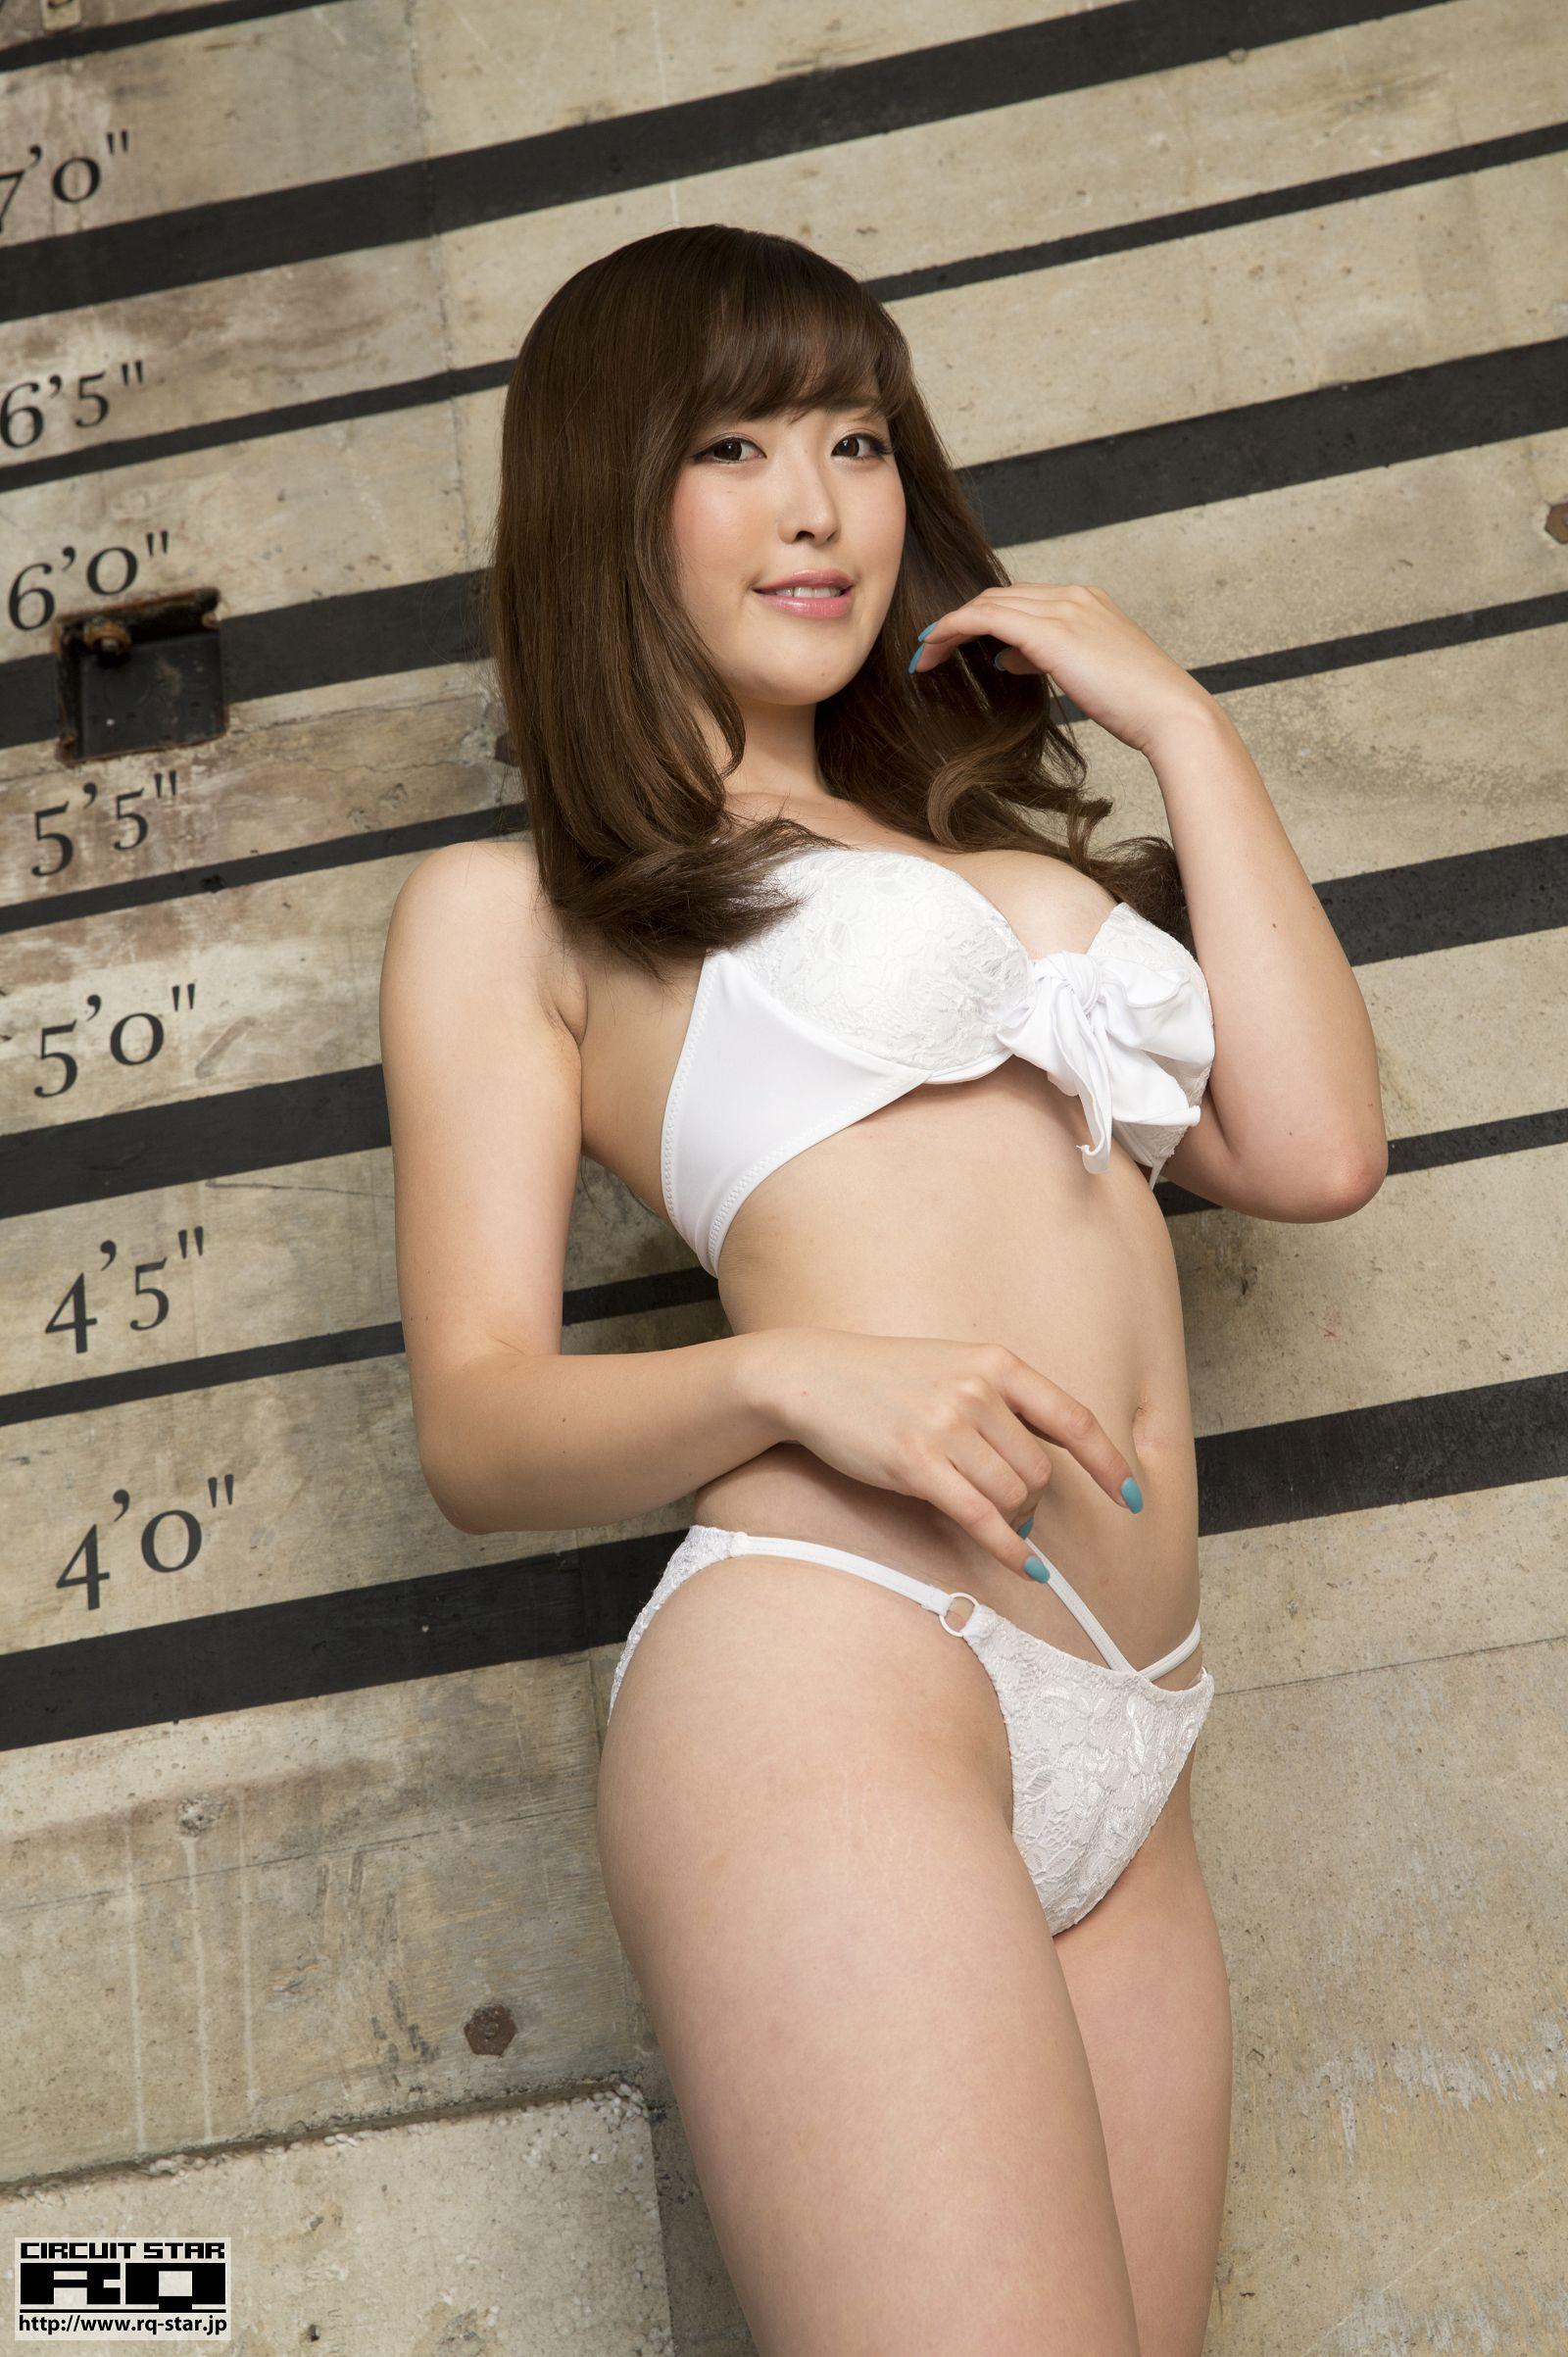 [RQ STAR美女] NO.01023 Sara Oshino 忍野さら Swim Suits[80P] RQ STAR 第1张